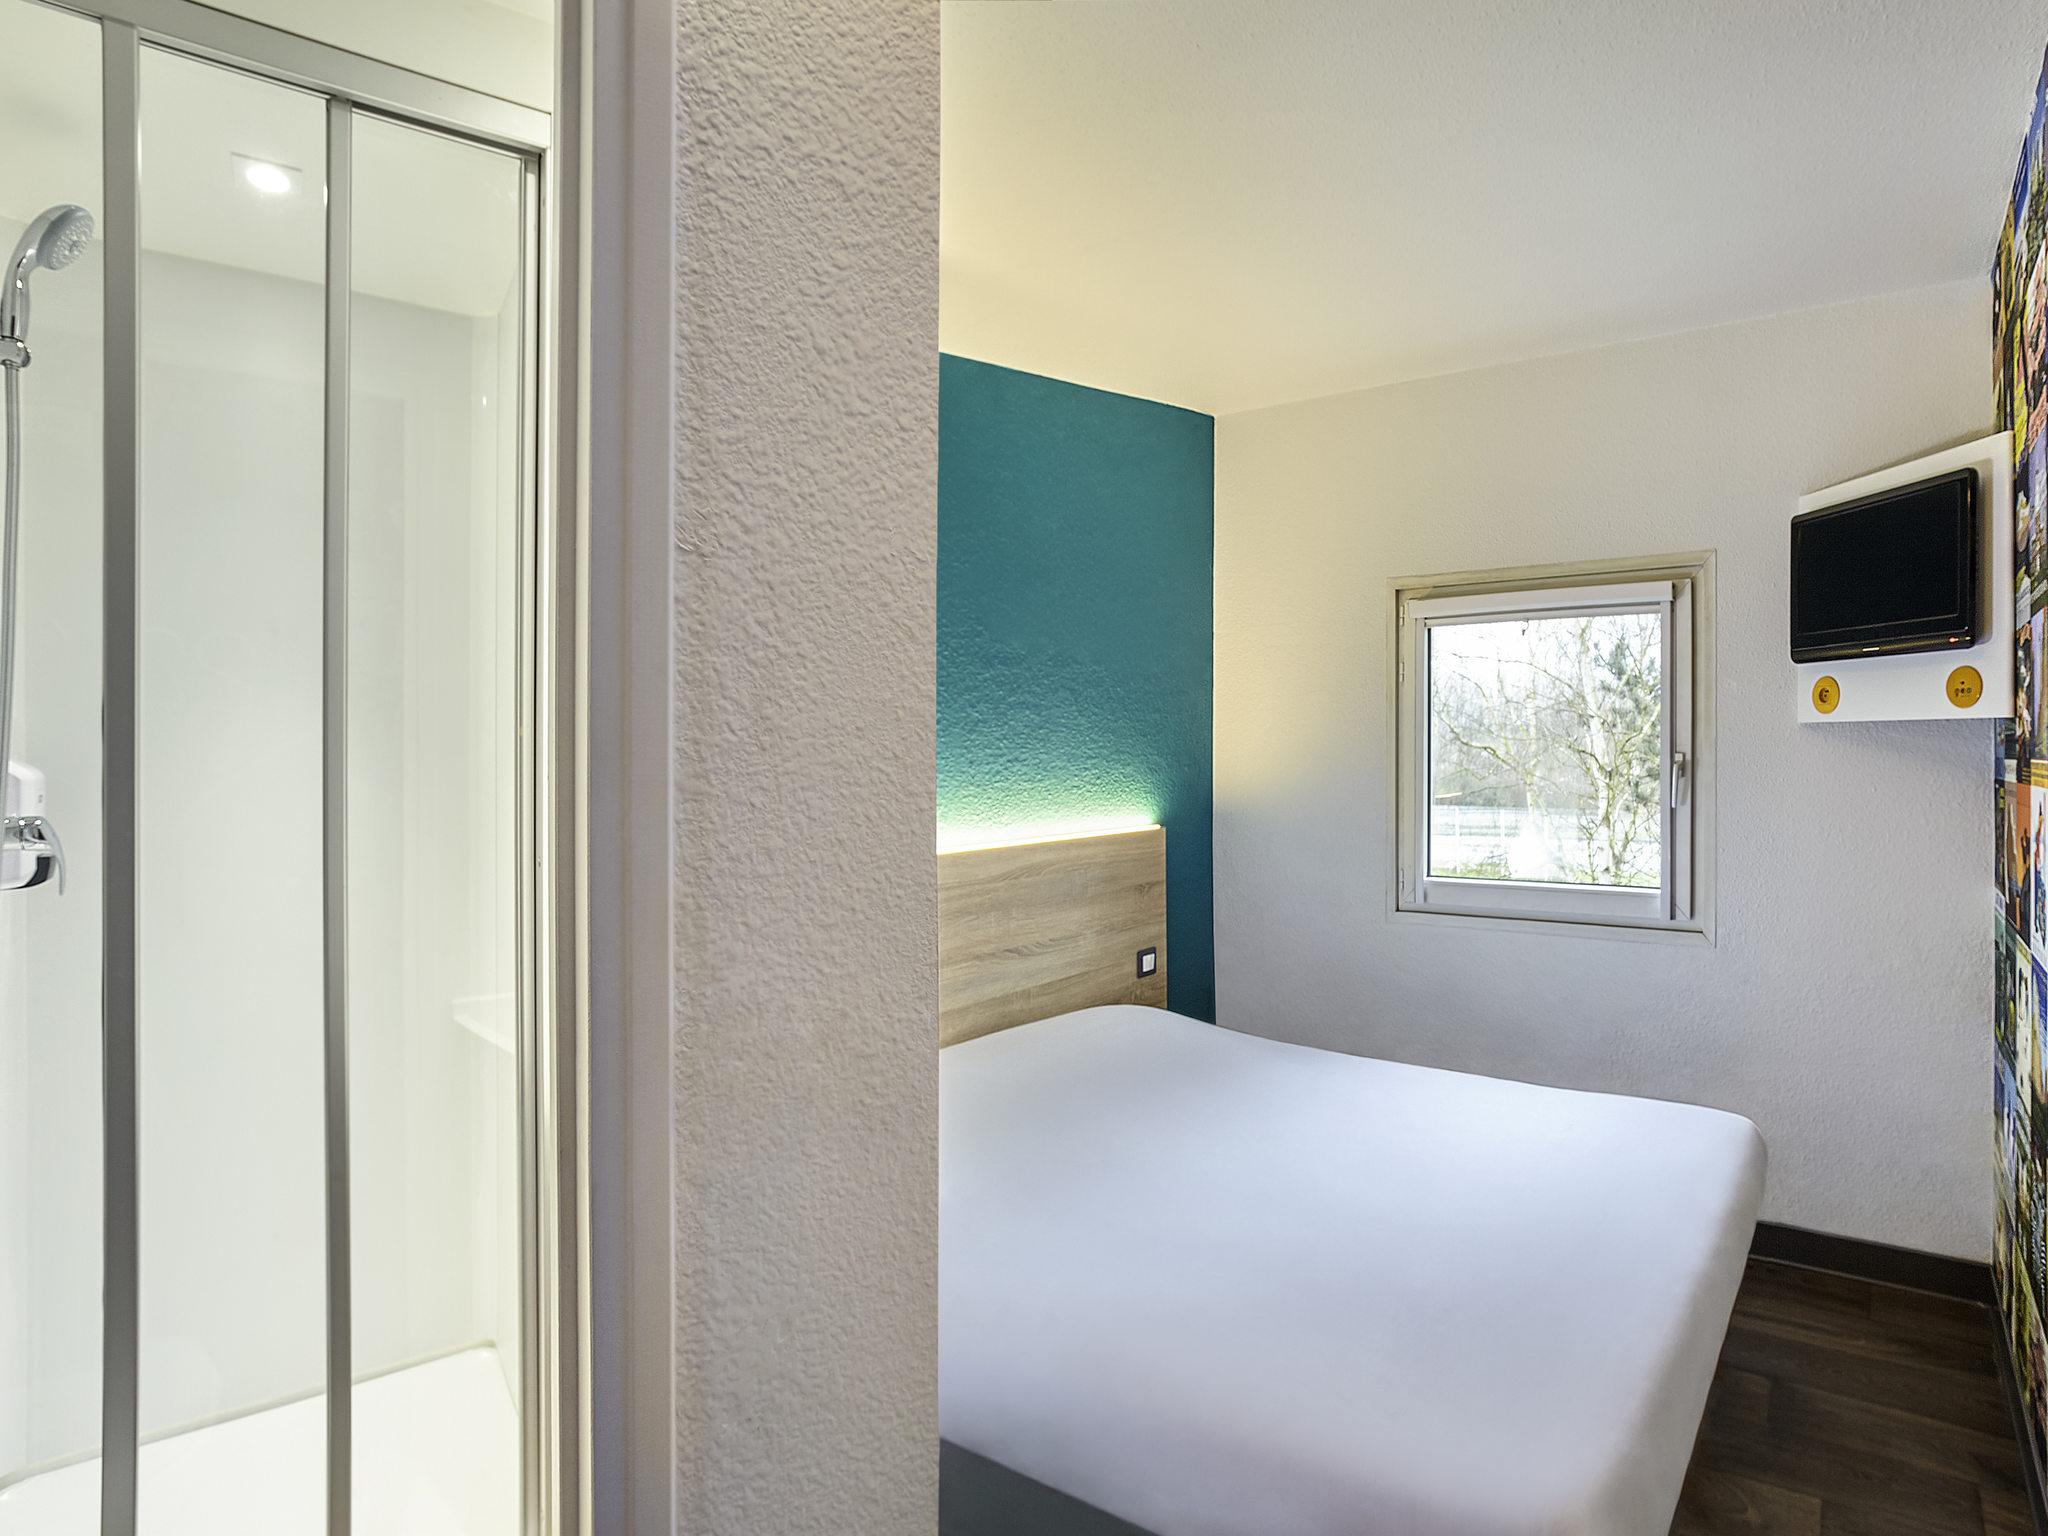 hotel in villeneuve loubet hotelf1 nice villeneuve loubet. Black Bedroom Furniture Sets. Home Design Ideas